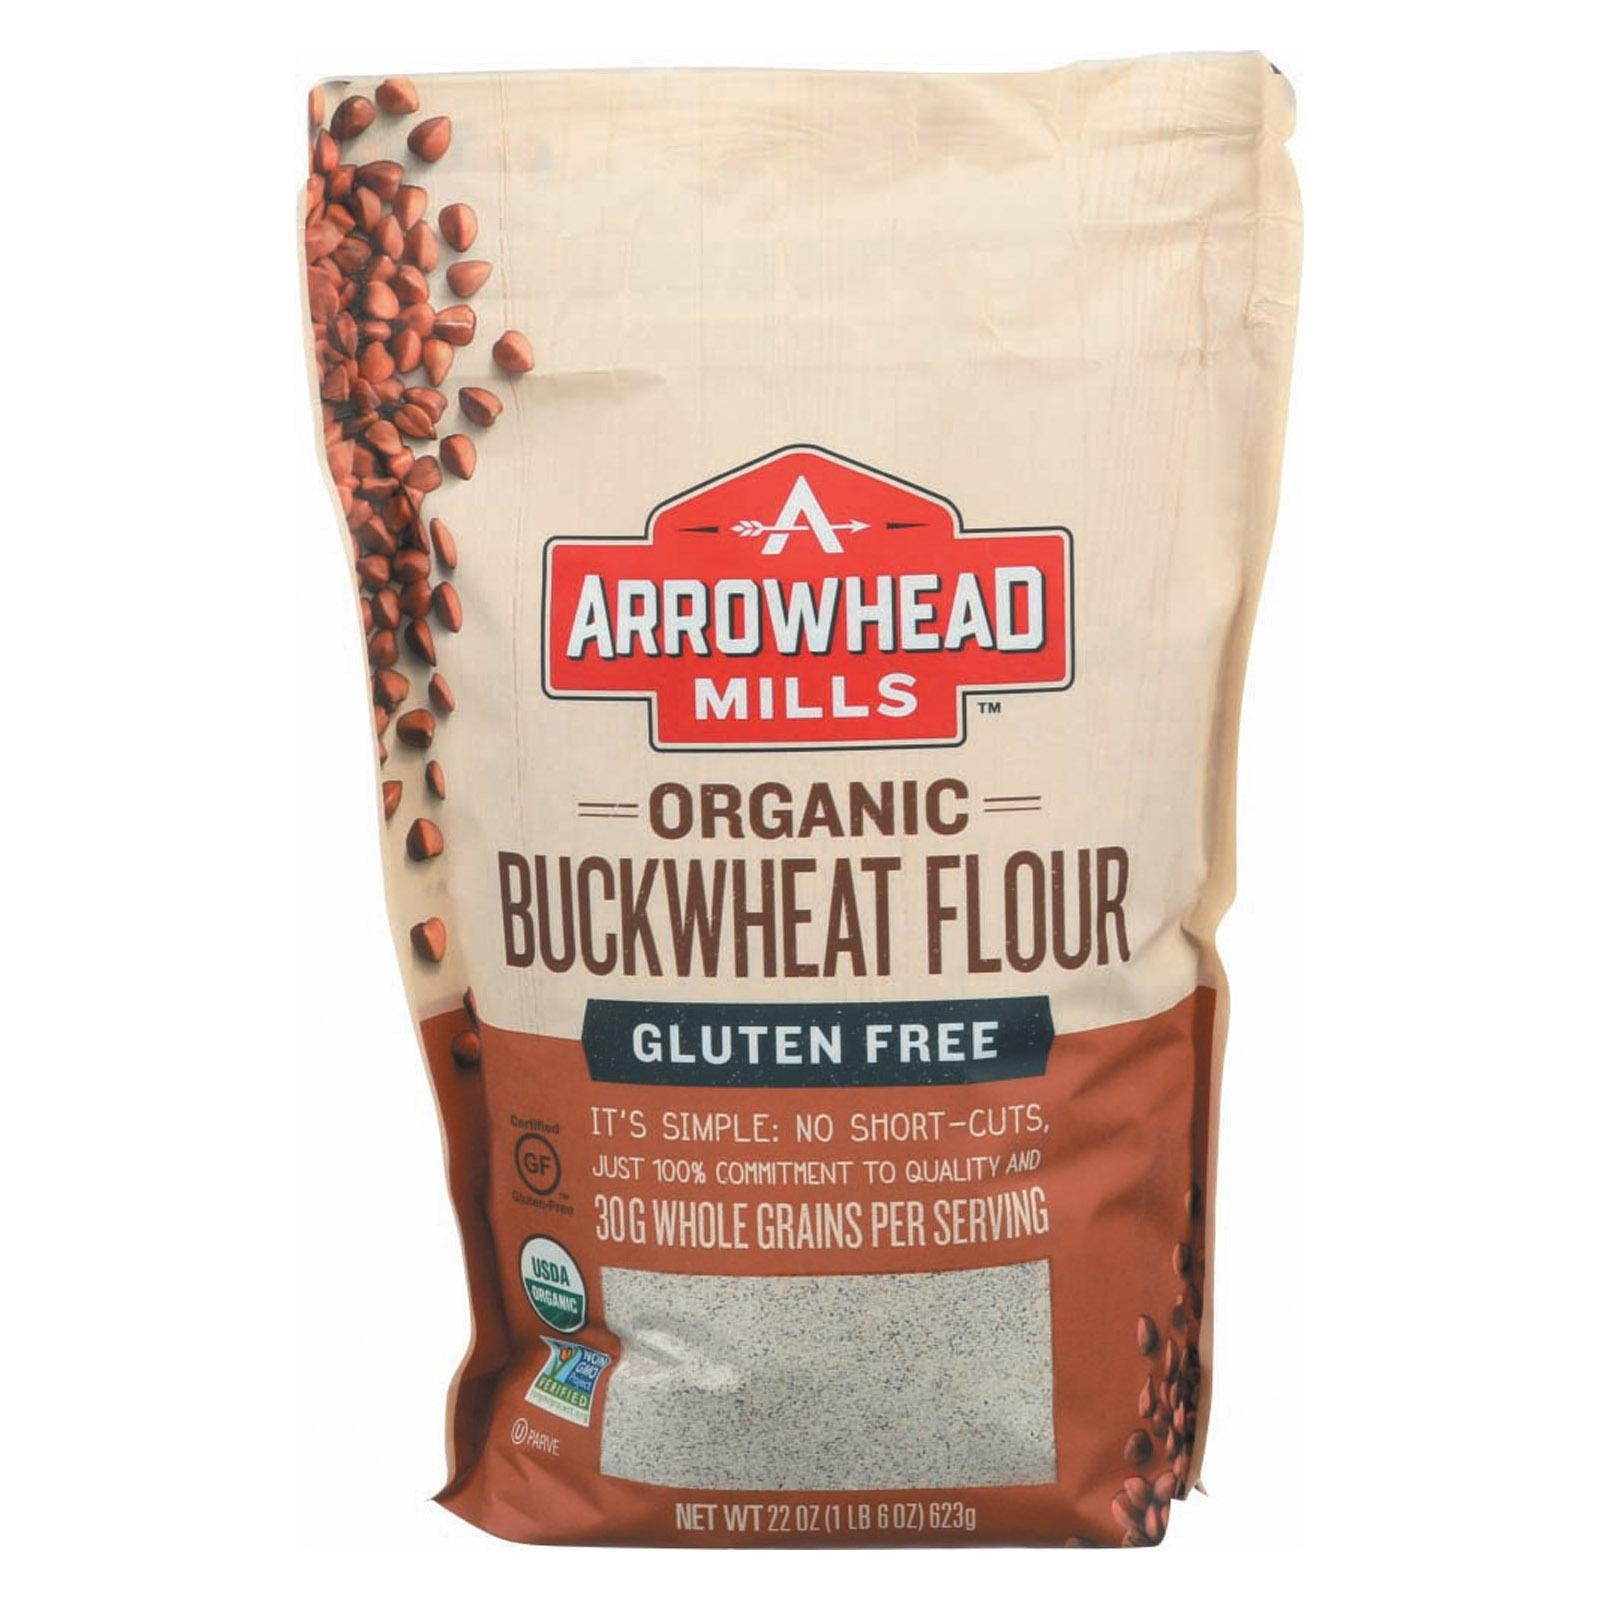 Arrowhead Mills Organic Bukwheat Flour - Gluten Free - pack of 6 - 22 Oz.